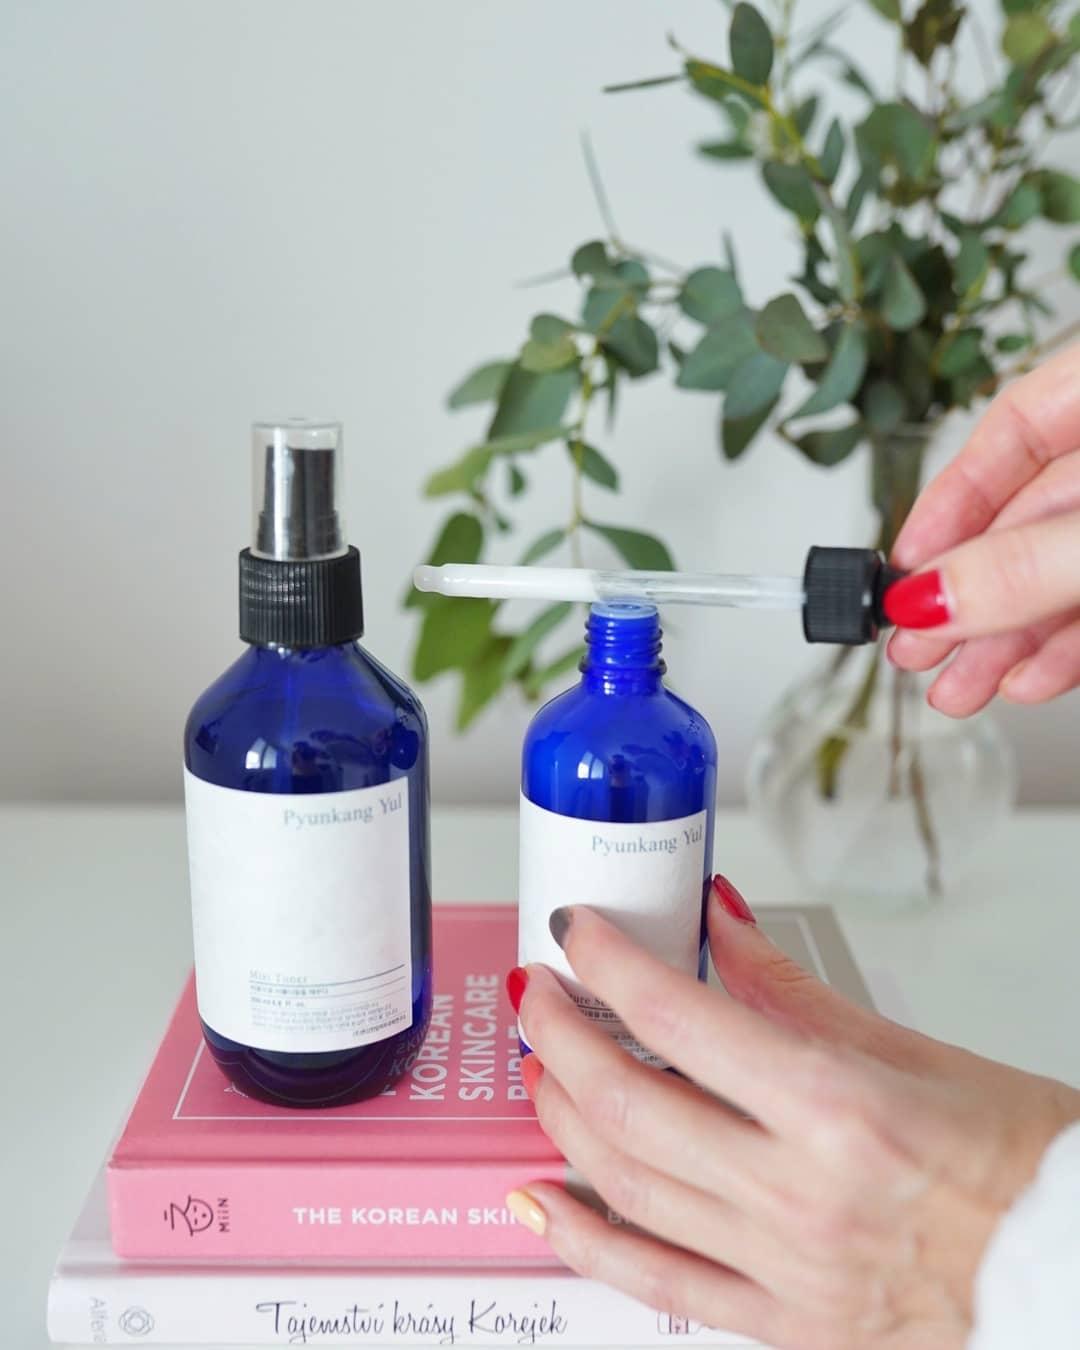 pyunkang yul kórejská kozmetika